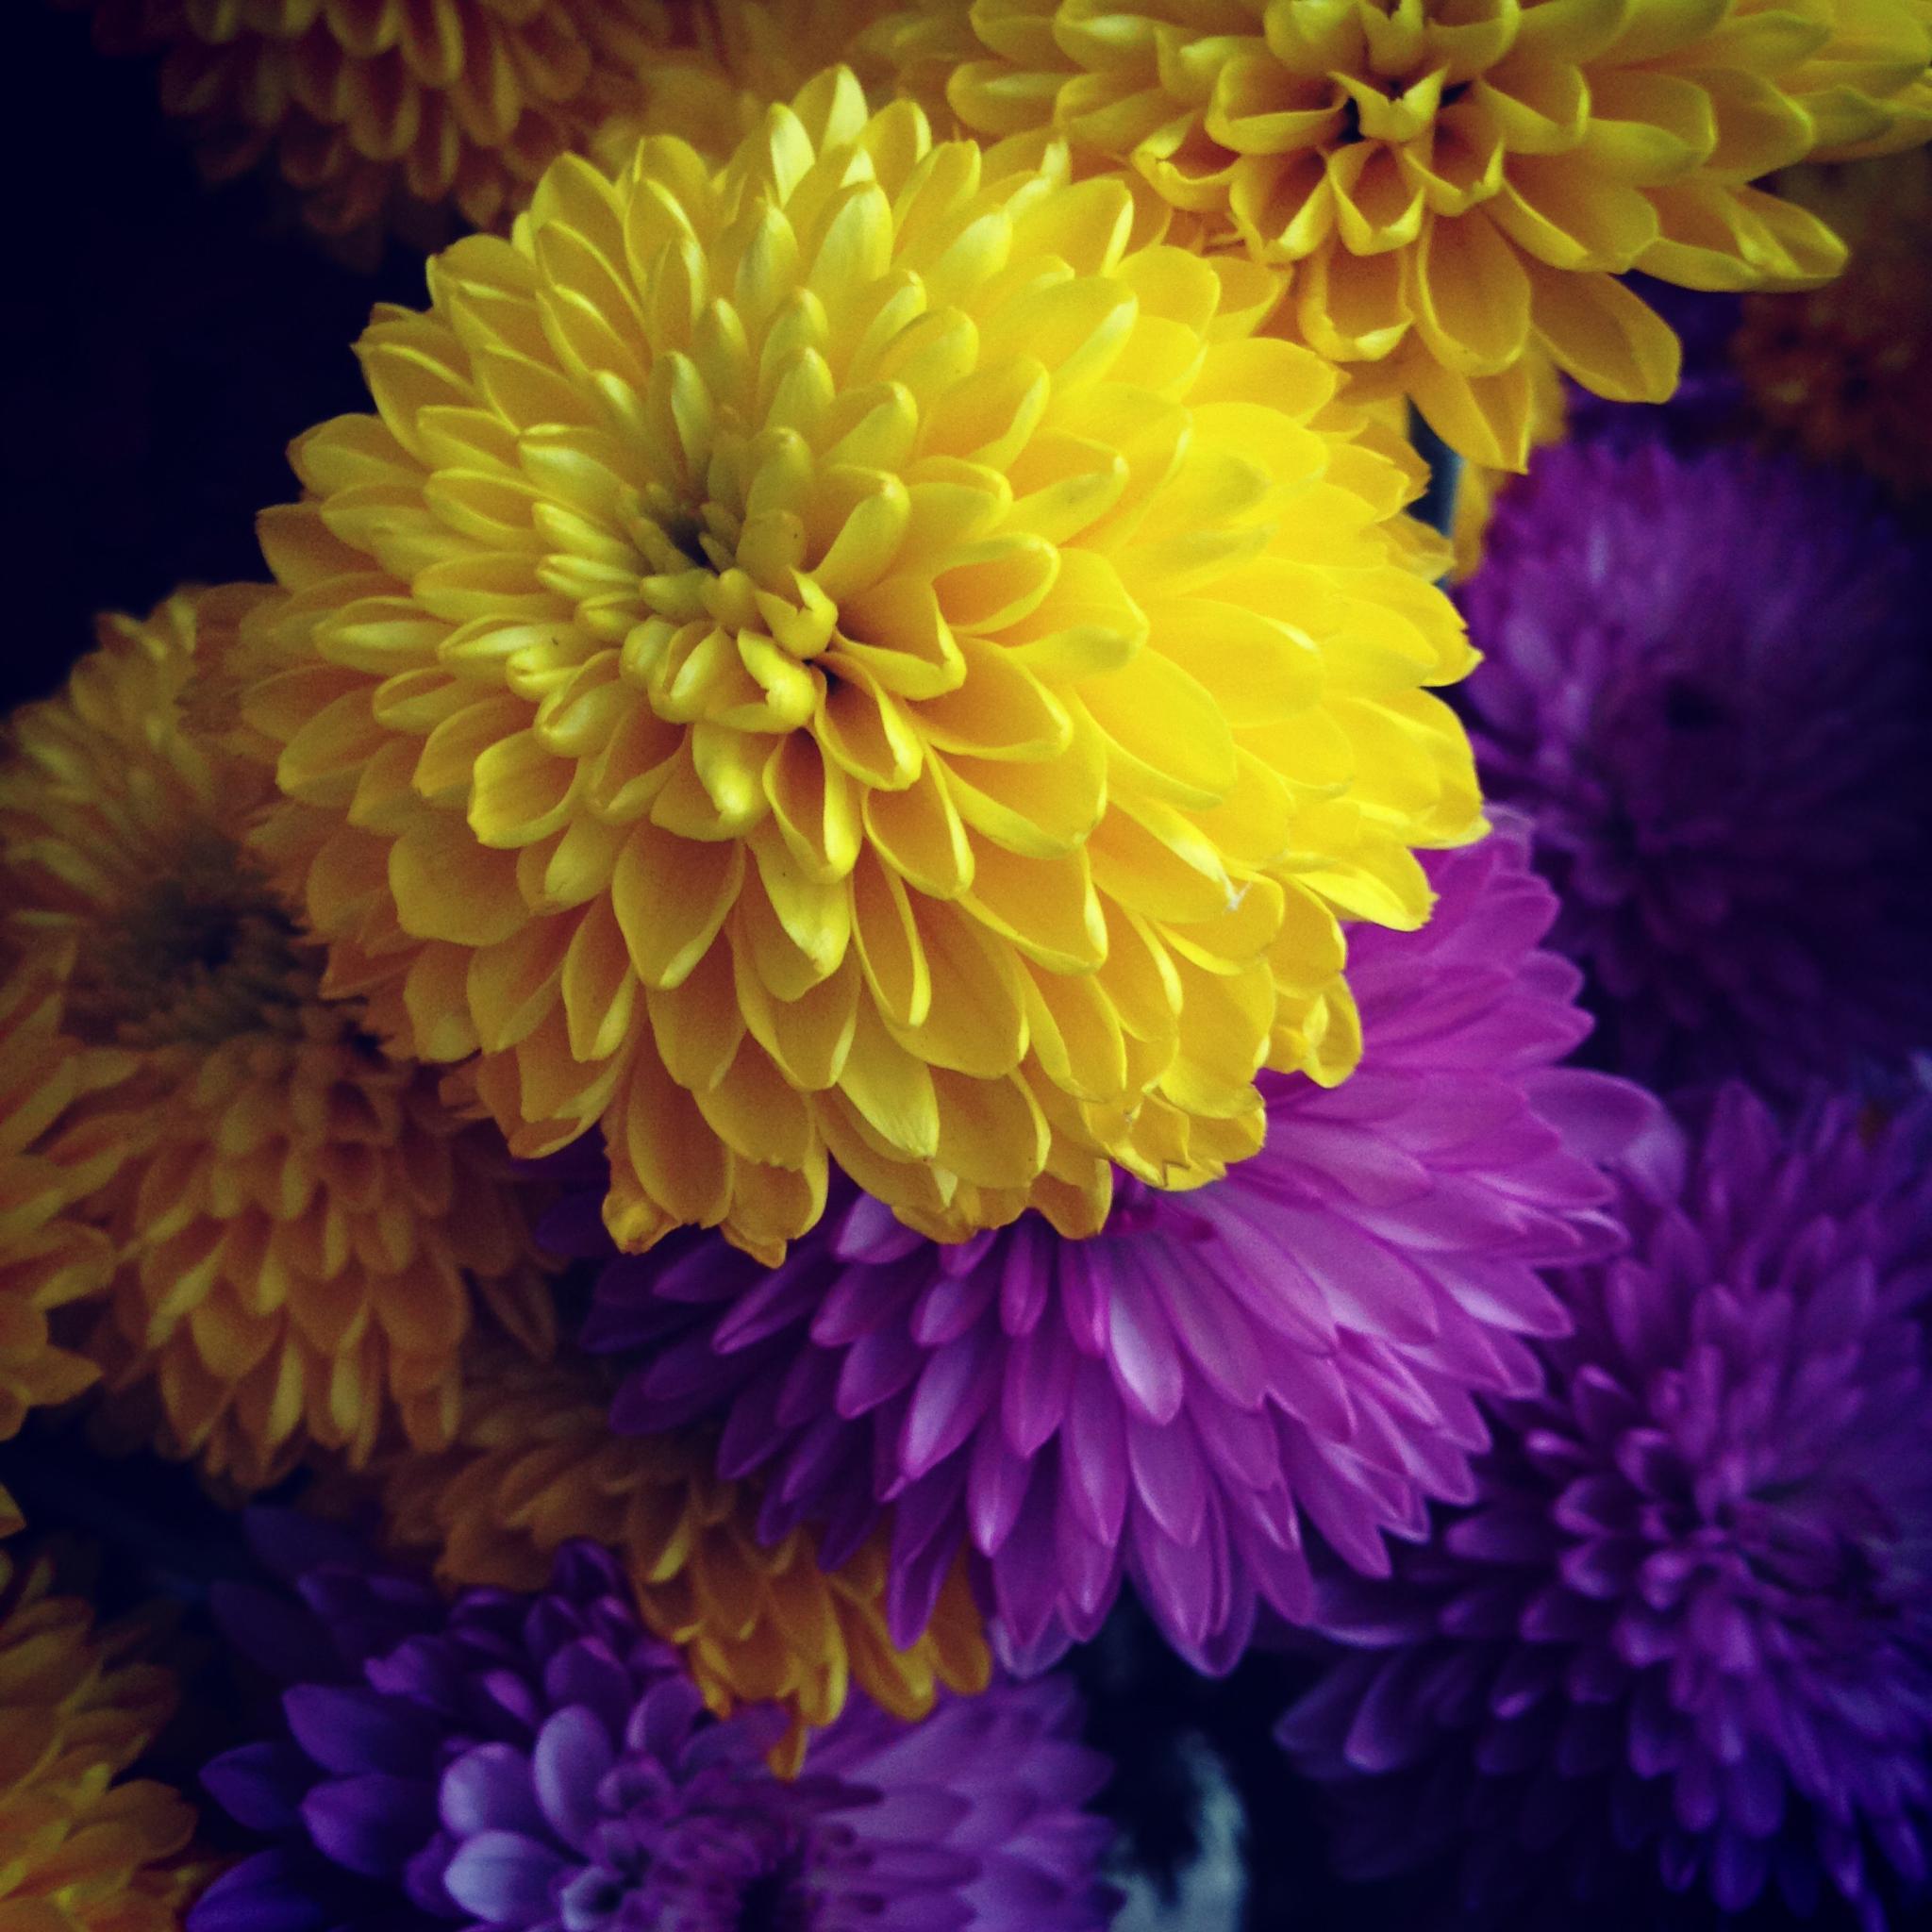 Colourful dahlias by pedrovit